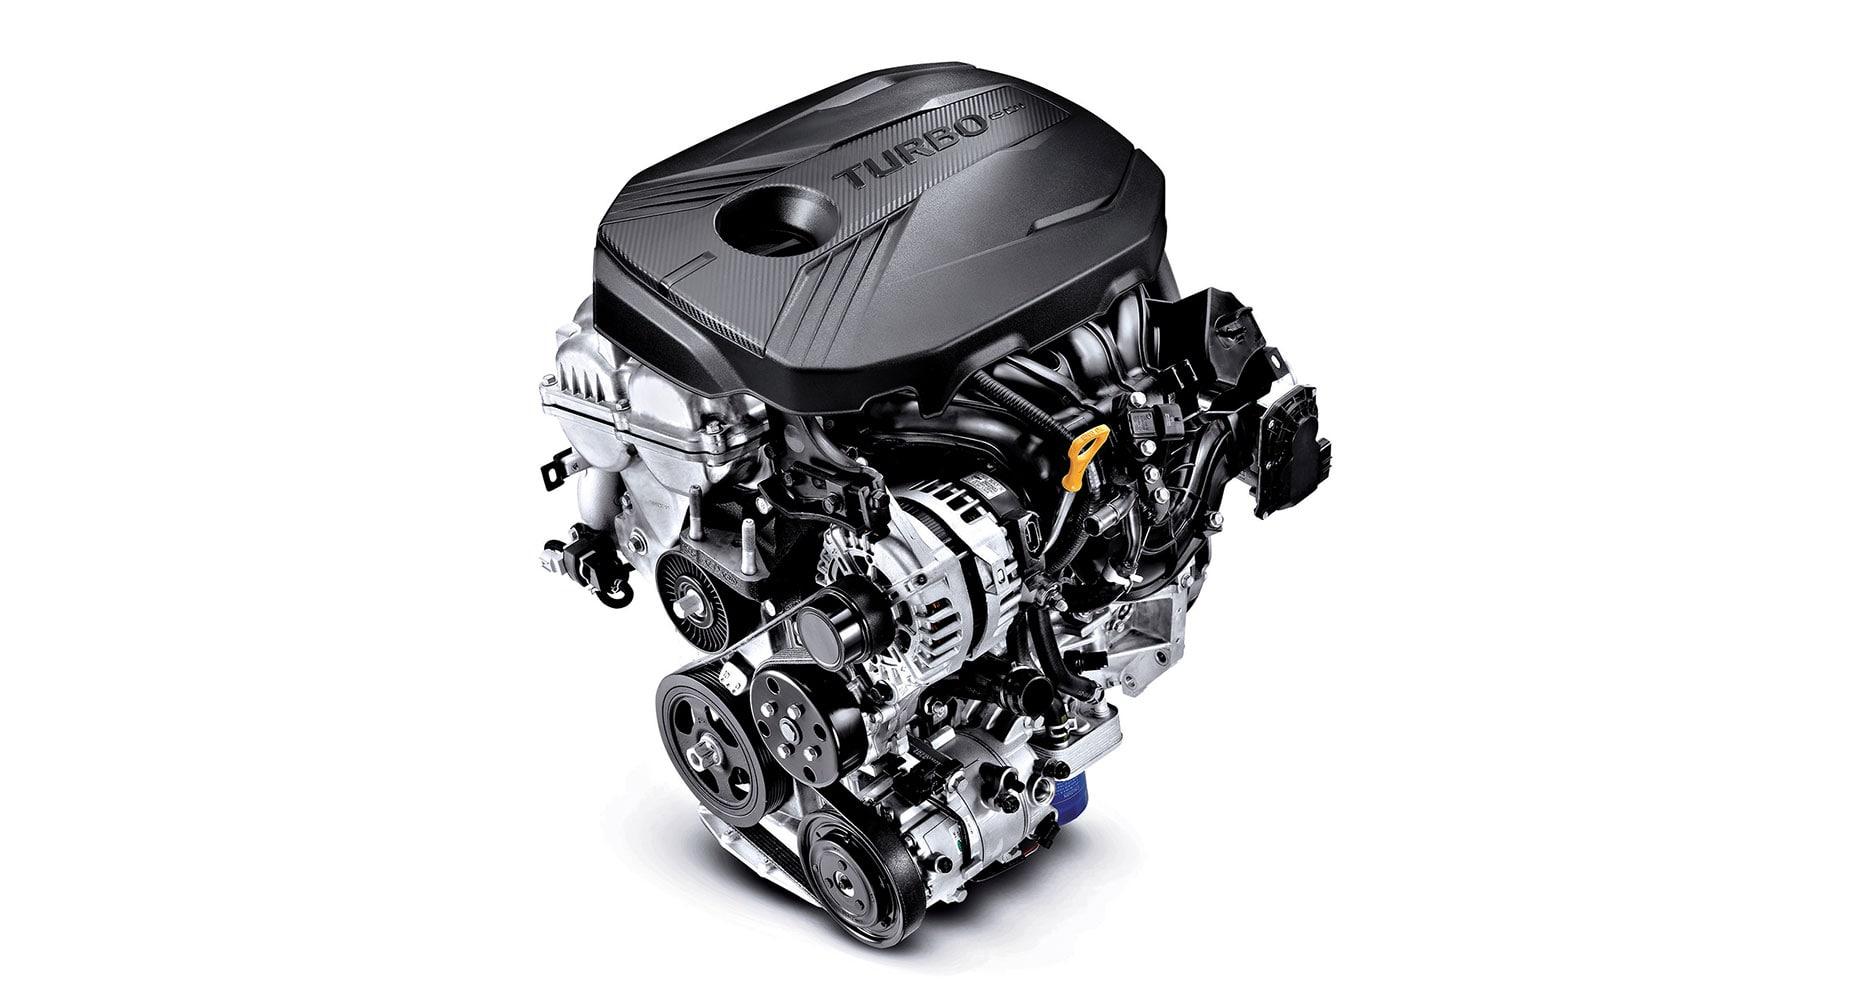 1.6L Turbocharged GDI engine